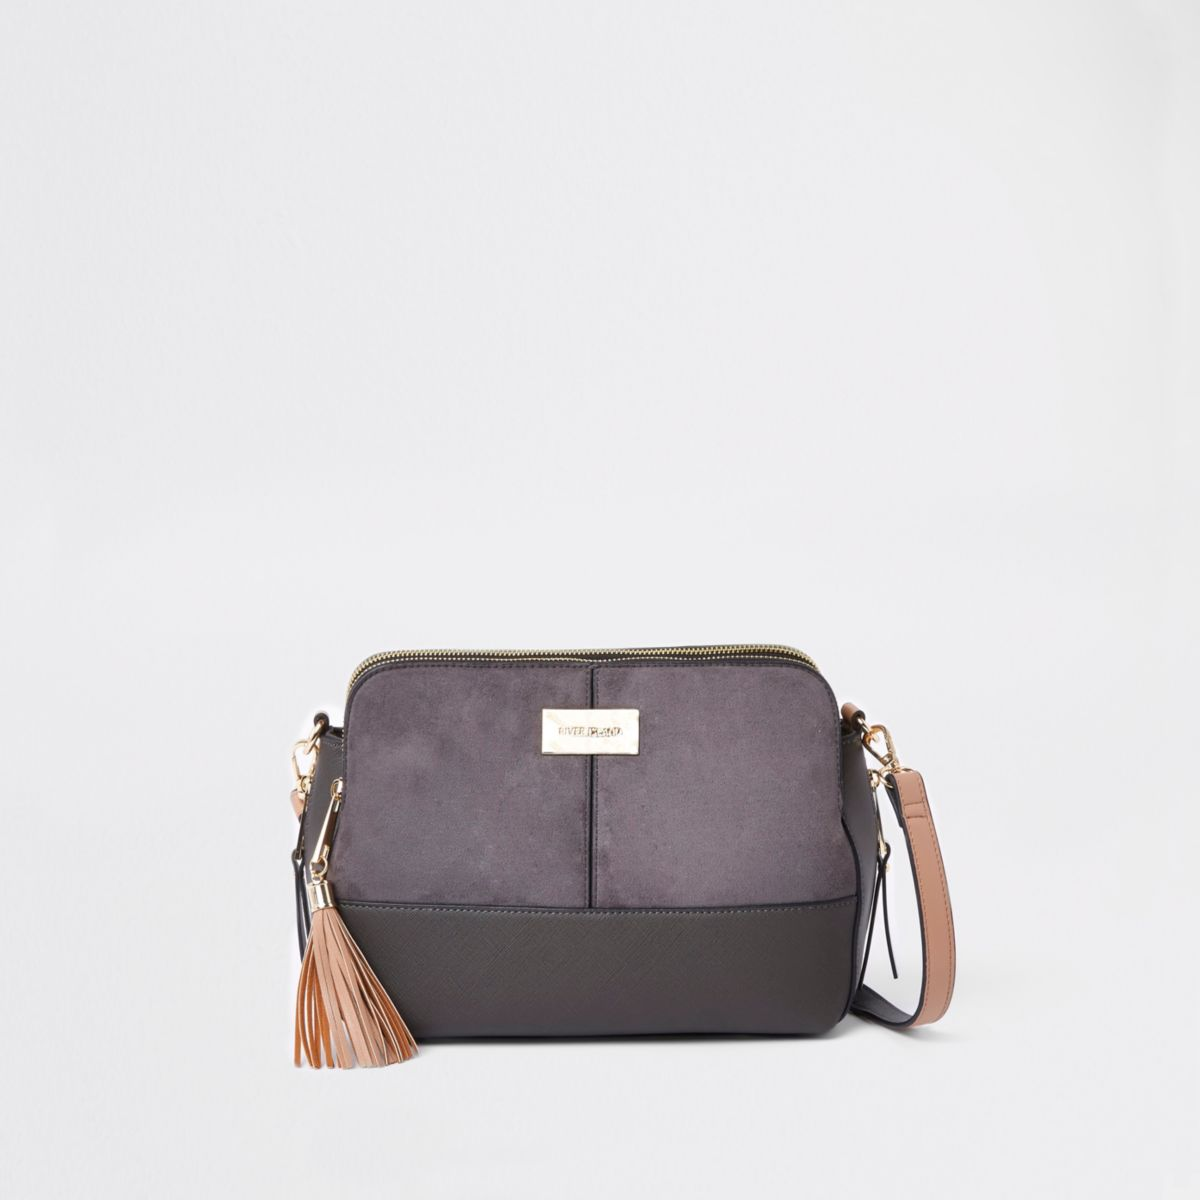 Dark grey triple compartment cross body bag